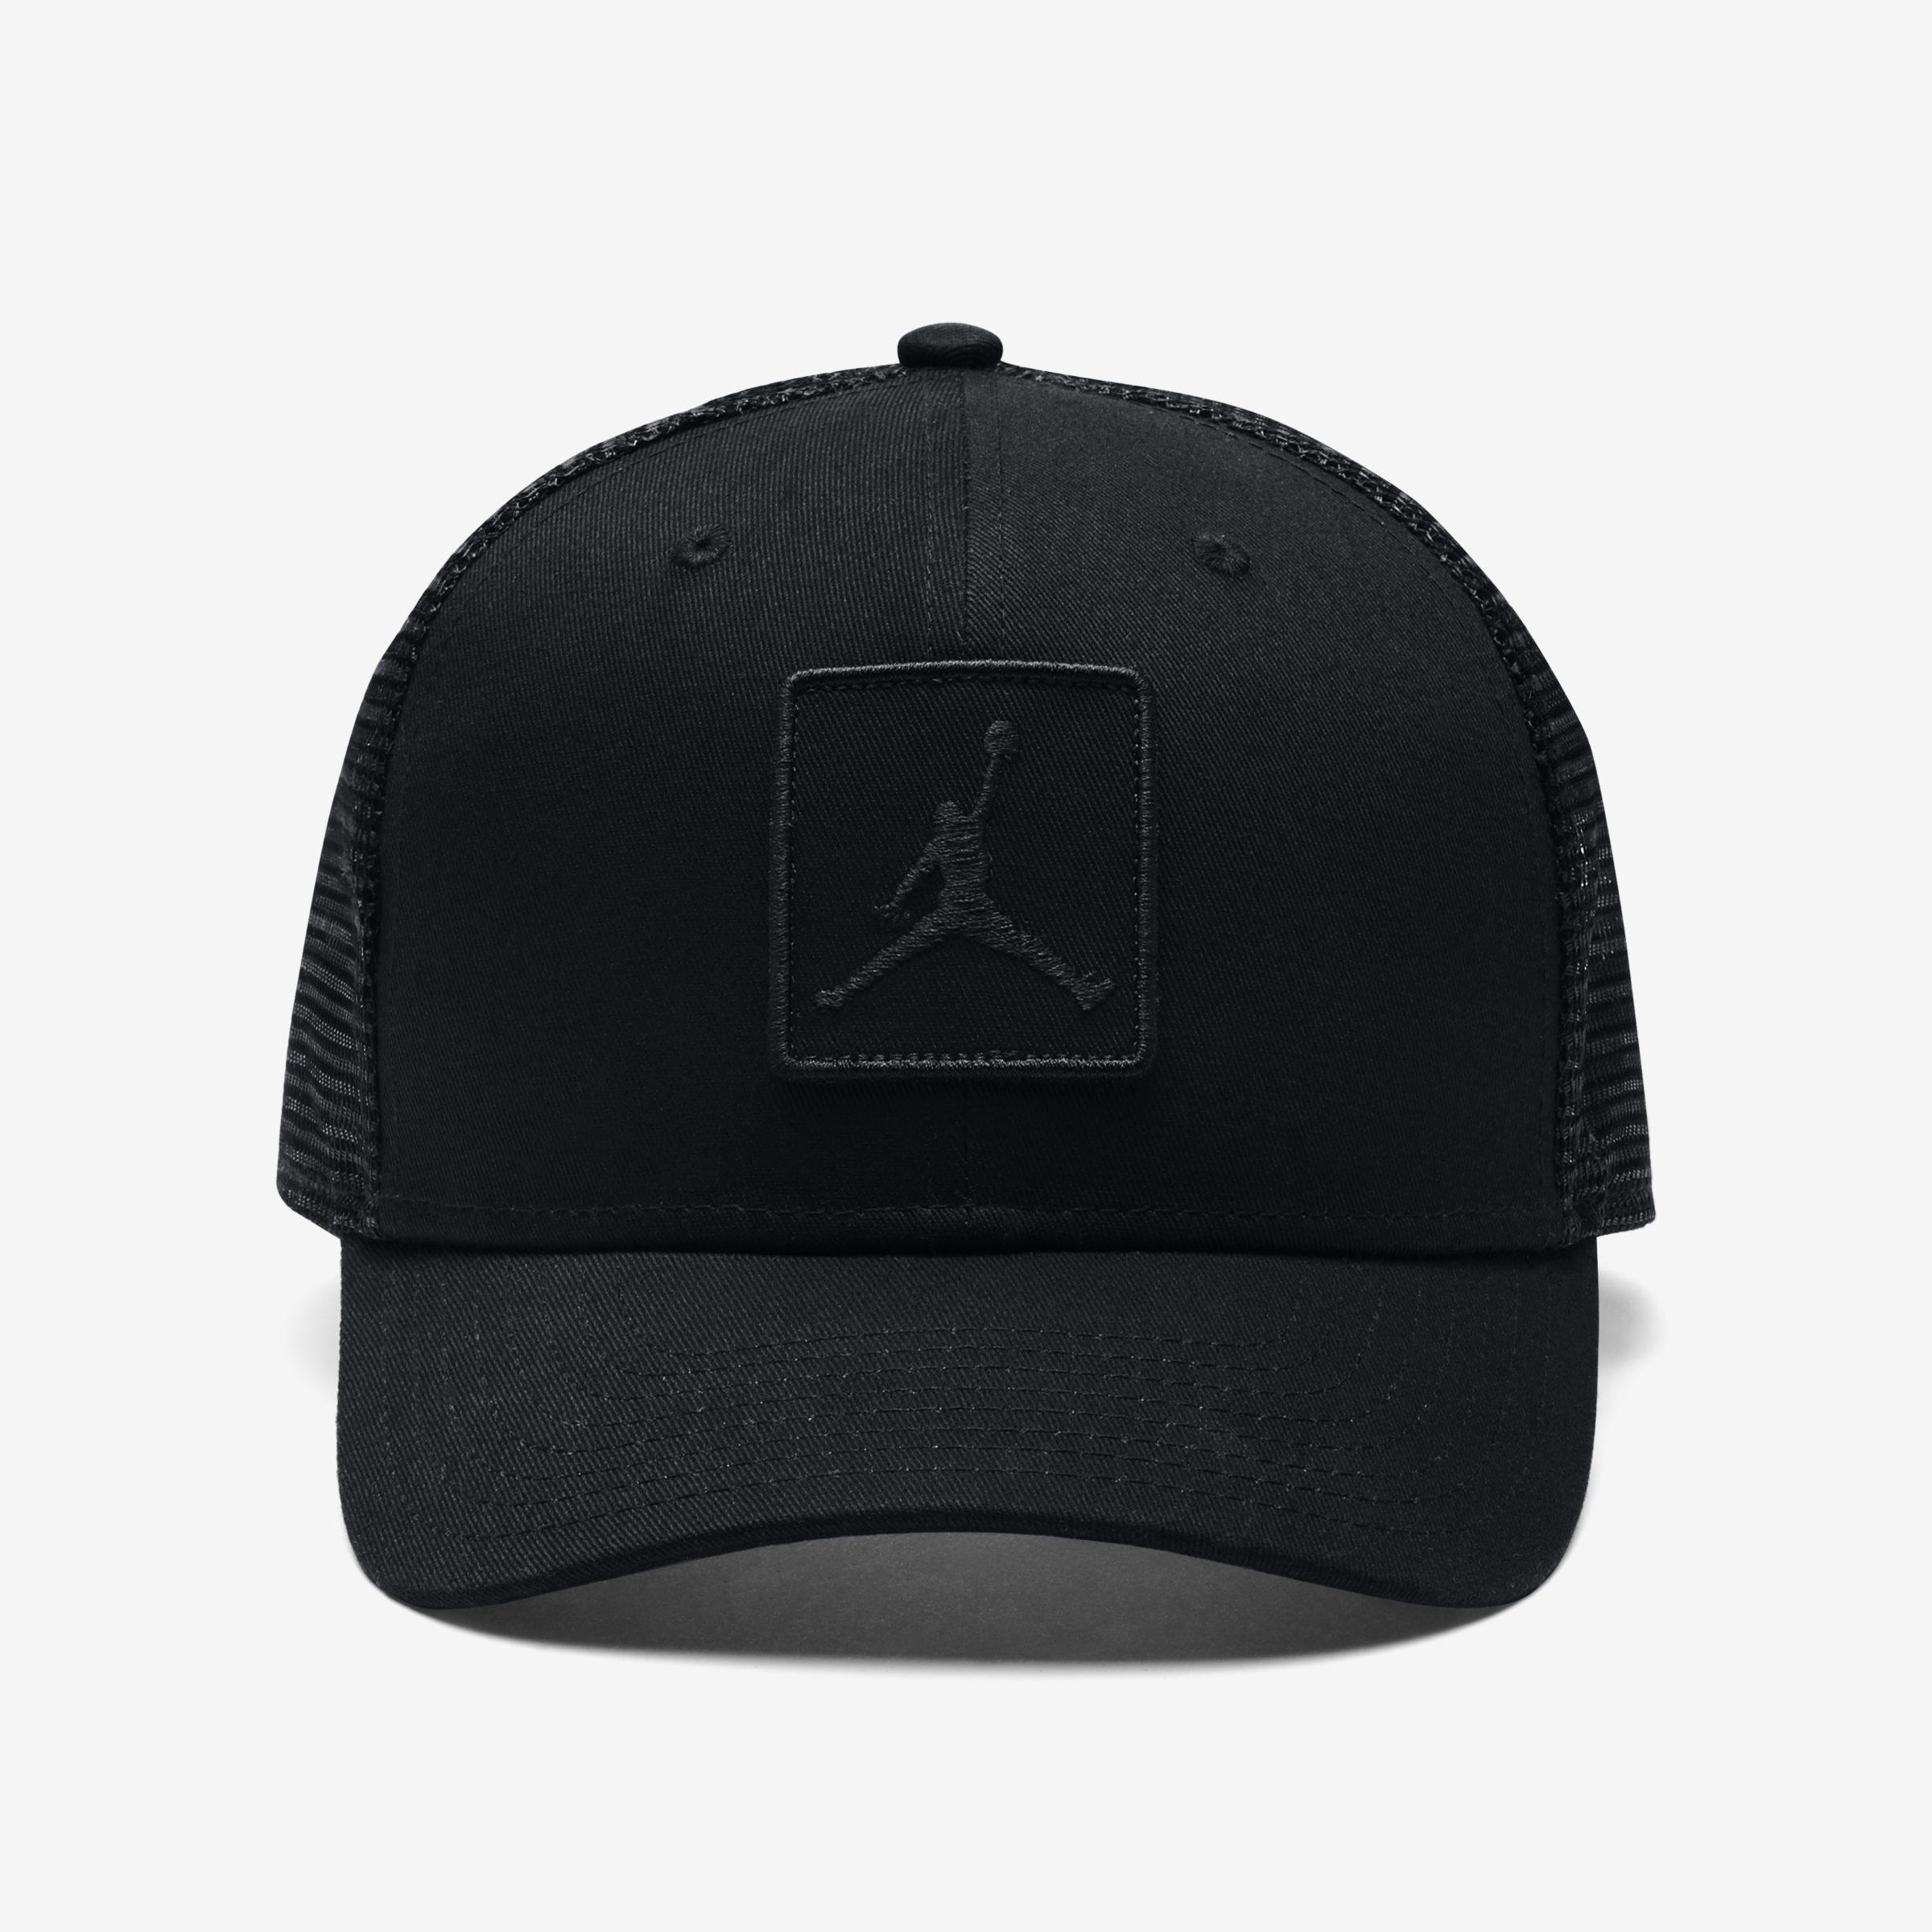 a41c6616be8 ... cheapest nike. mens black jordan jumpman classic99 trucker adjustable  hat c822f 43a60